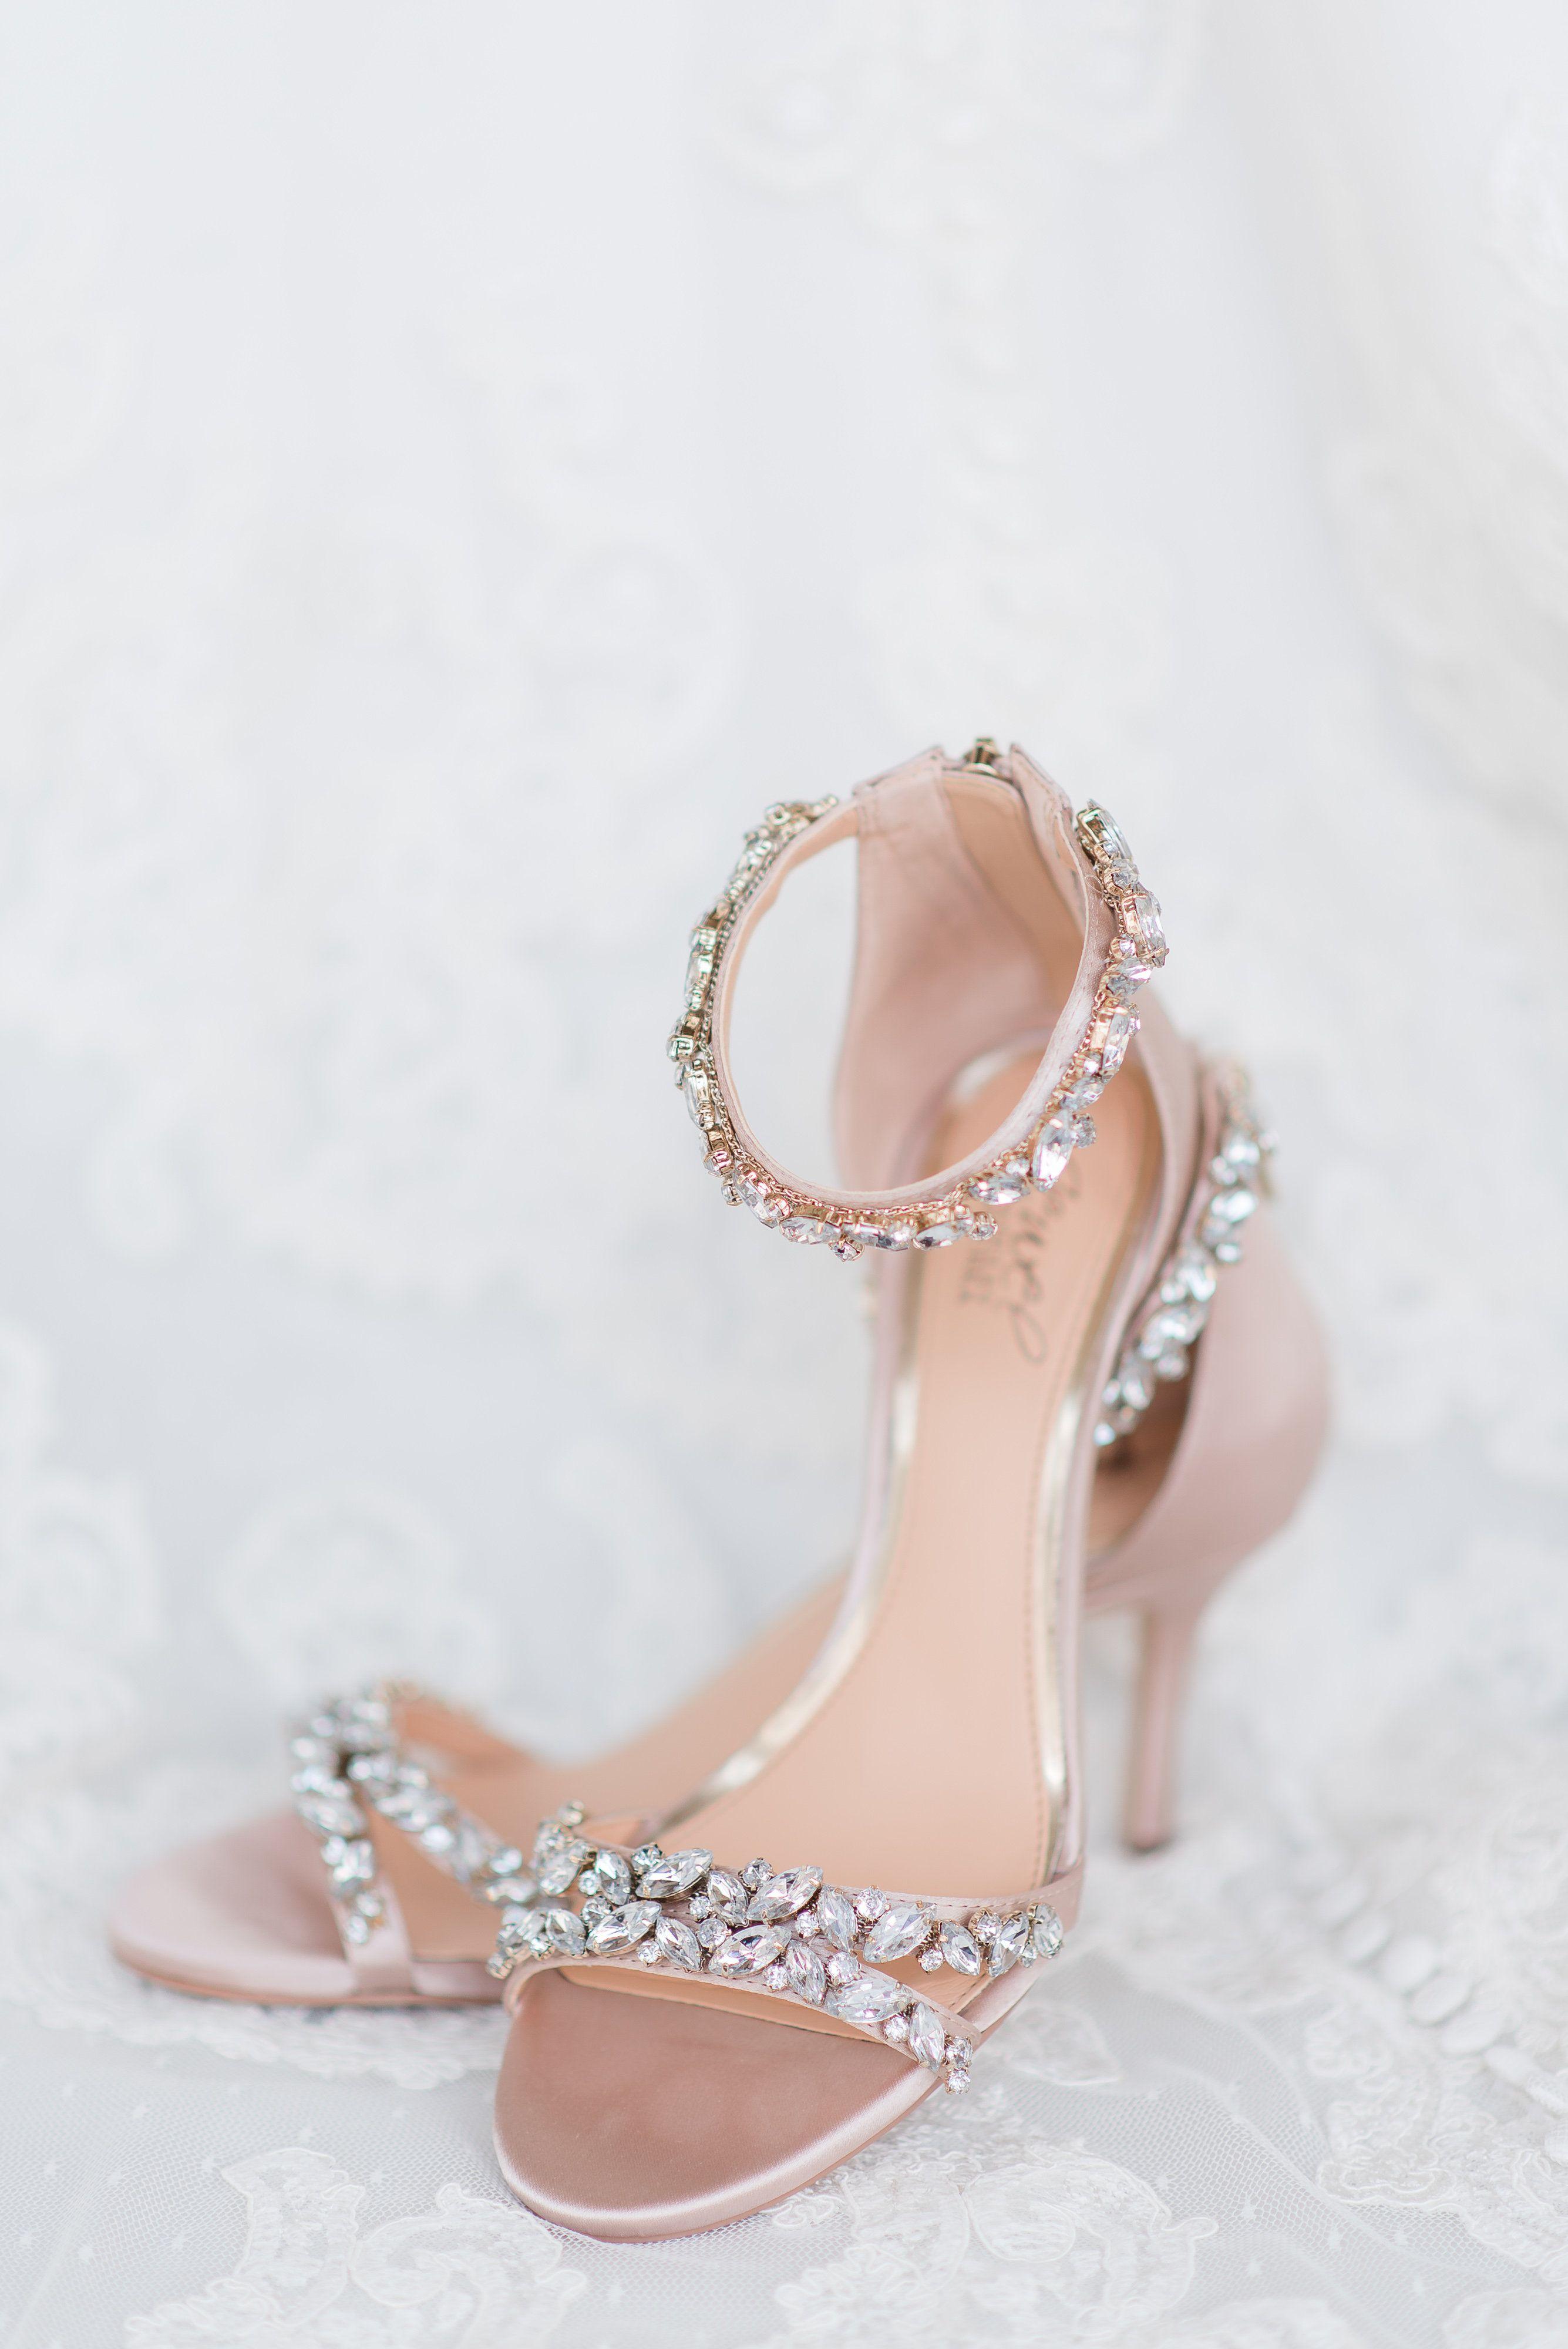 Badgley Mischka Wedding Shoes Bride S Day Details Sparkly Bridal